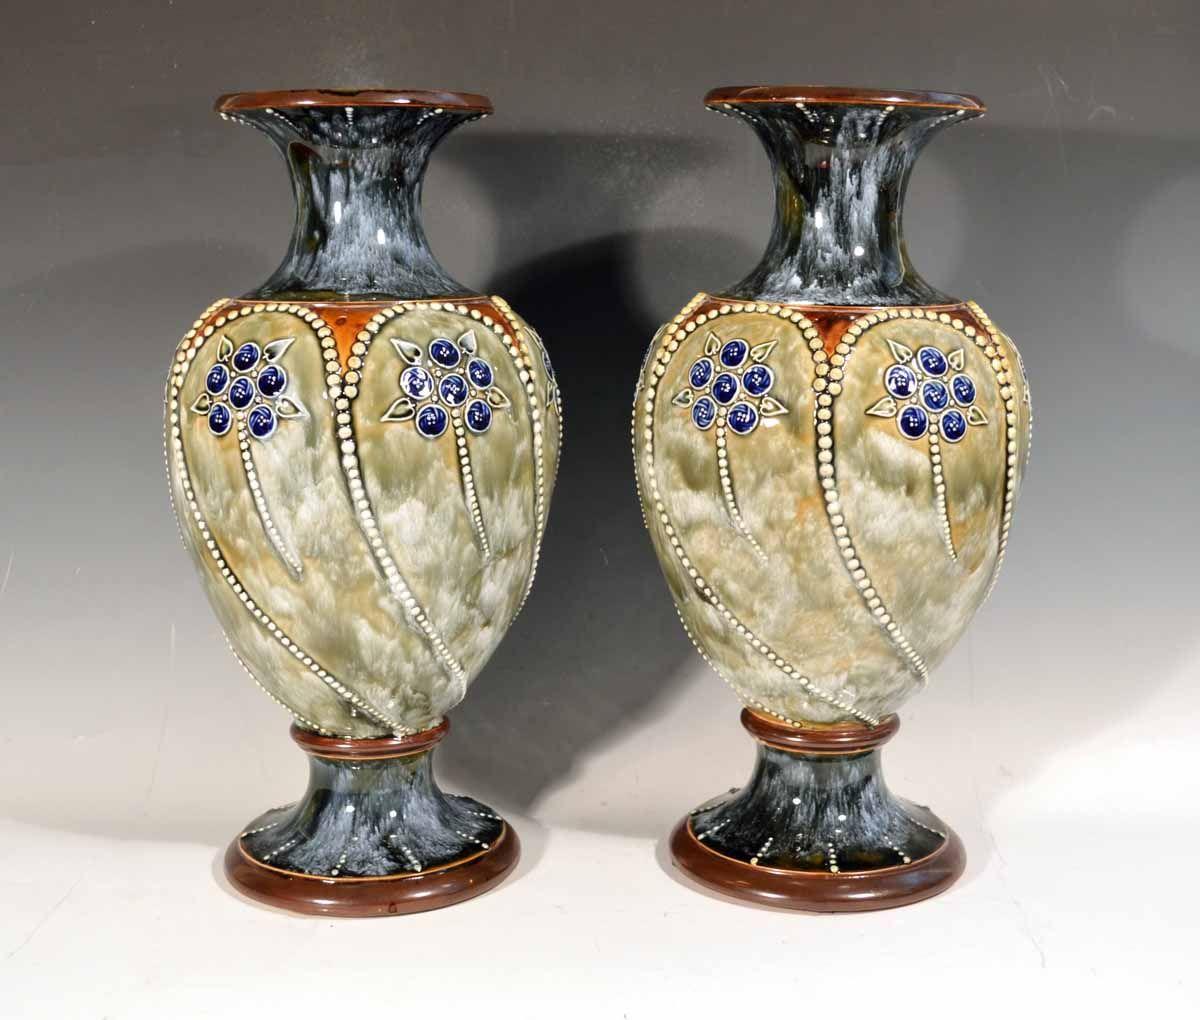 Royal doulton marbled pottery vases 1903 05 british antique royal doulton marbled pottery vases 1903 05 reviewsmspy